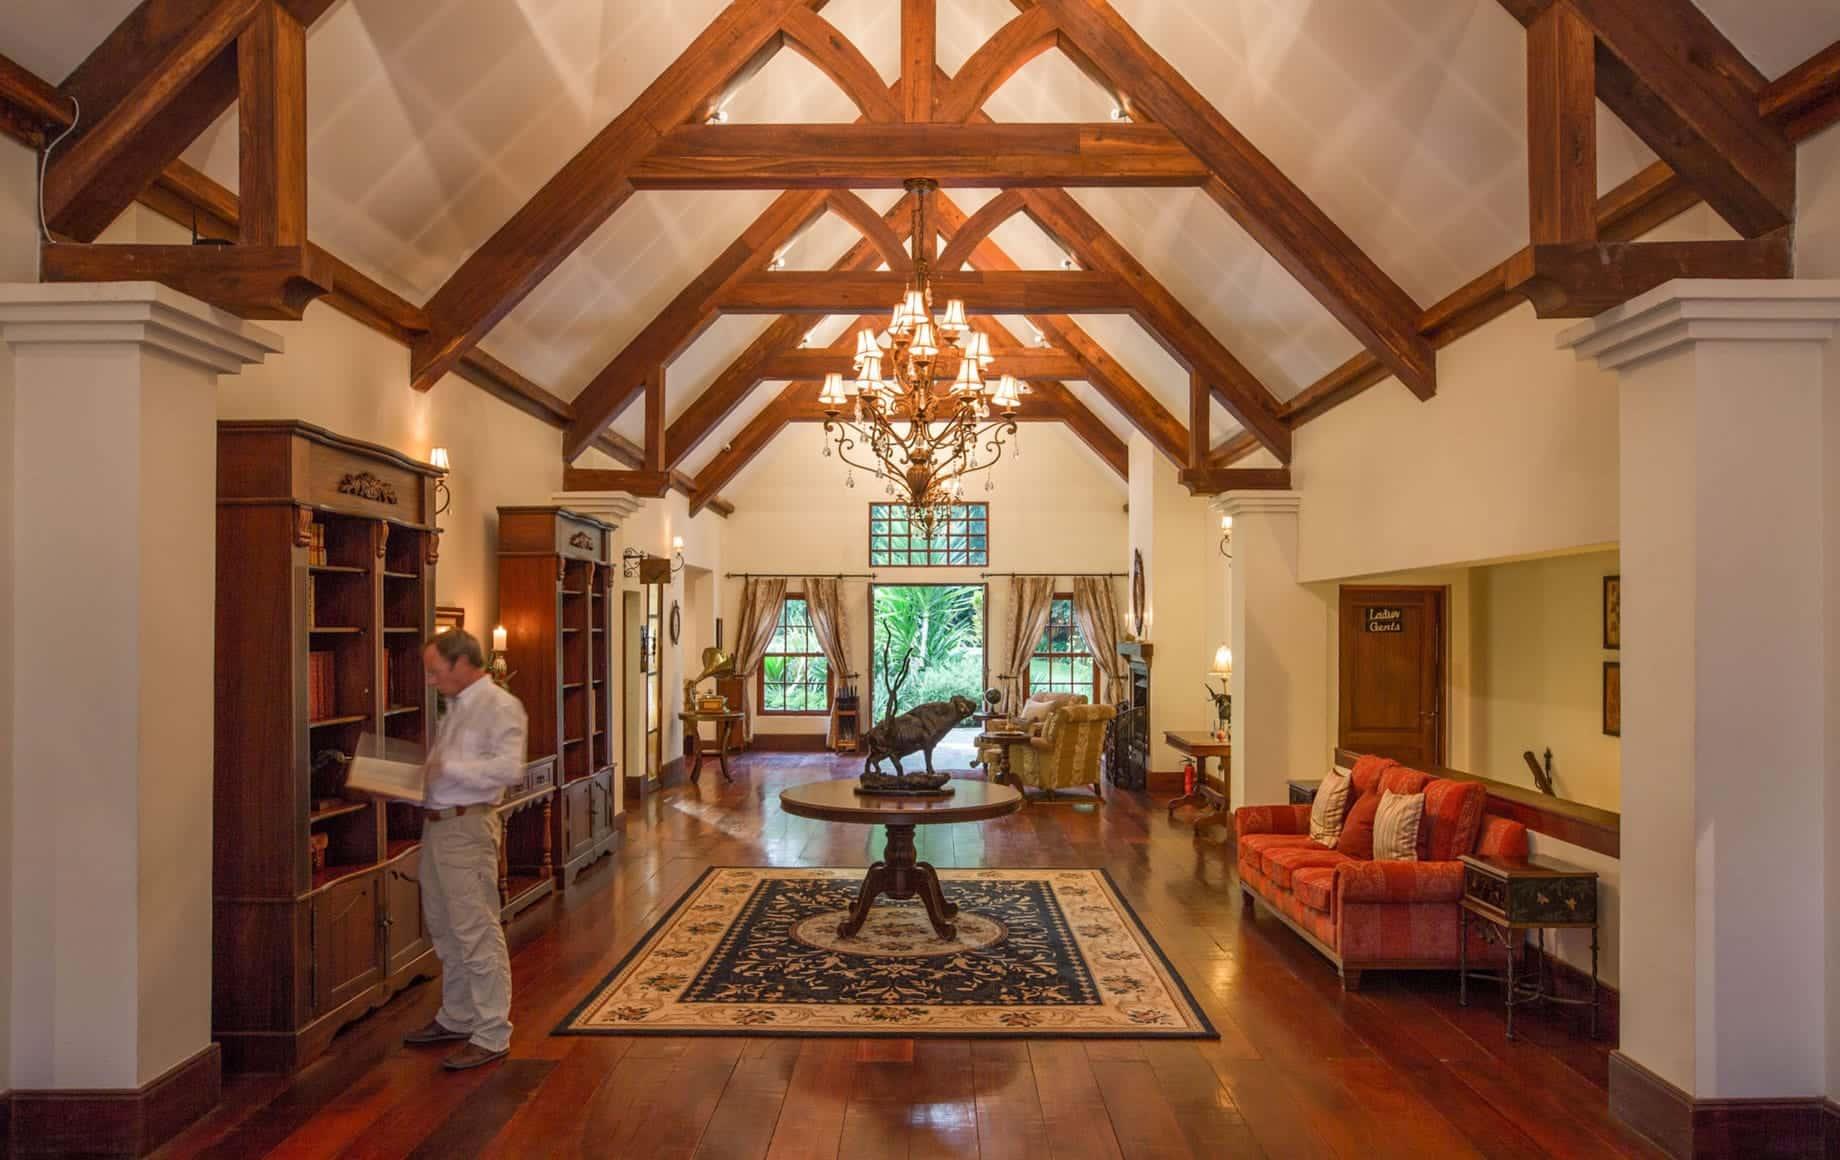 The Manor at Ngorongoro Crater interior